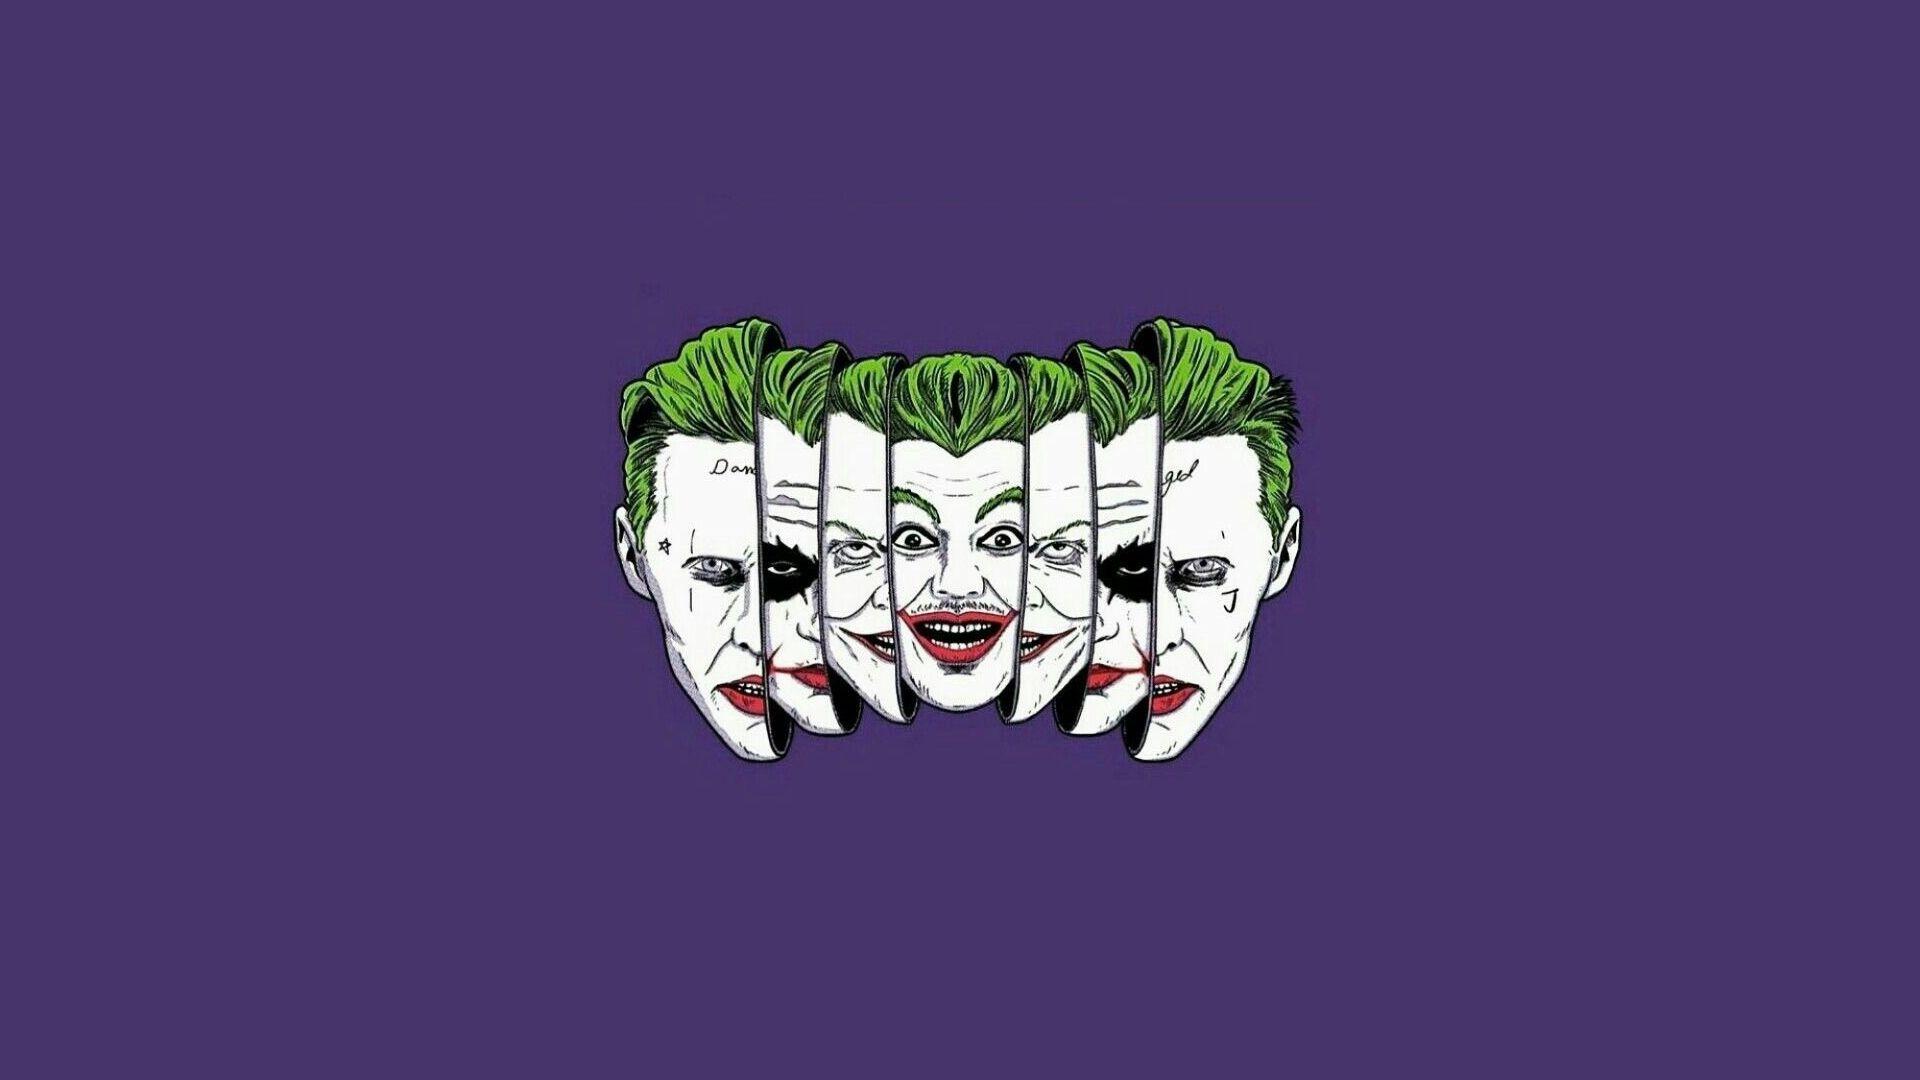 Suicide Squad Joker art, Free Download Wallpaper